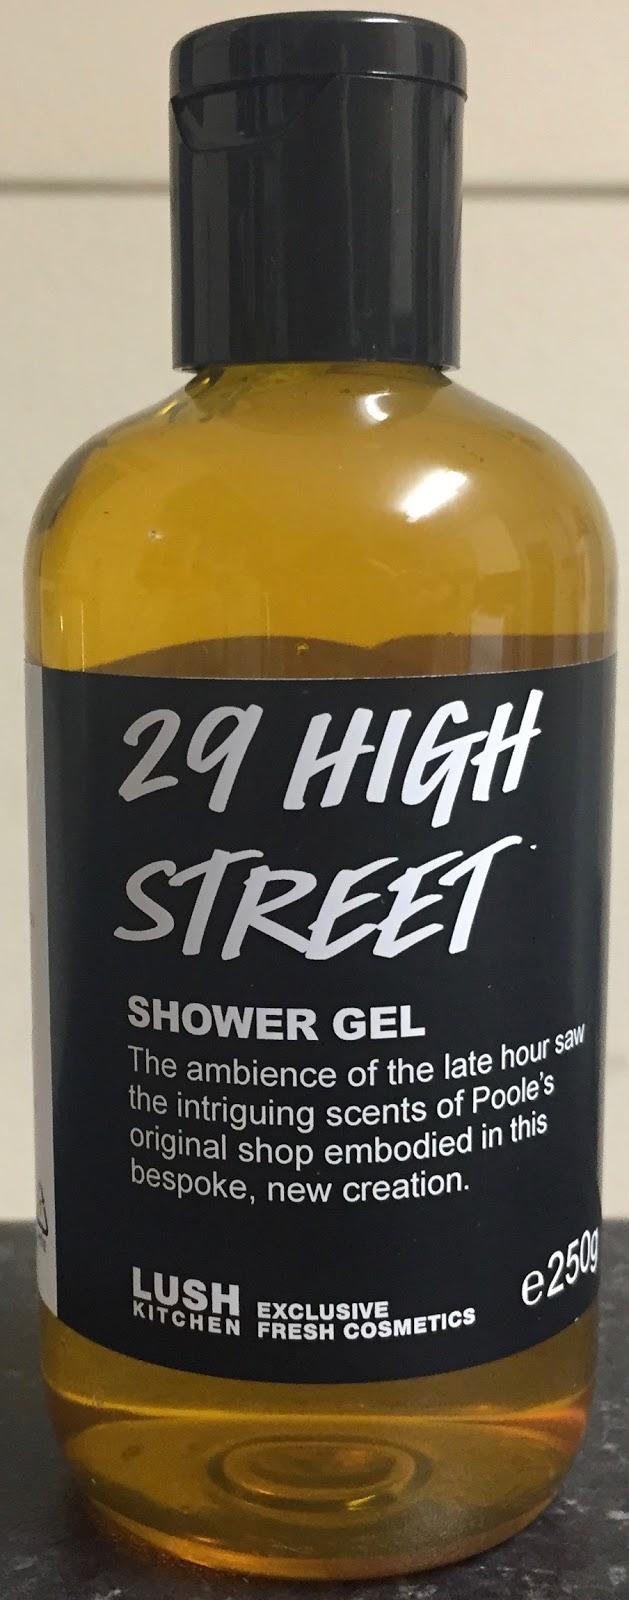 All Things Lush UK: 29 High Street Shower Gel